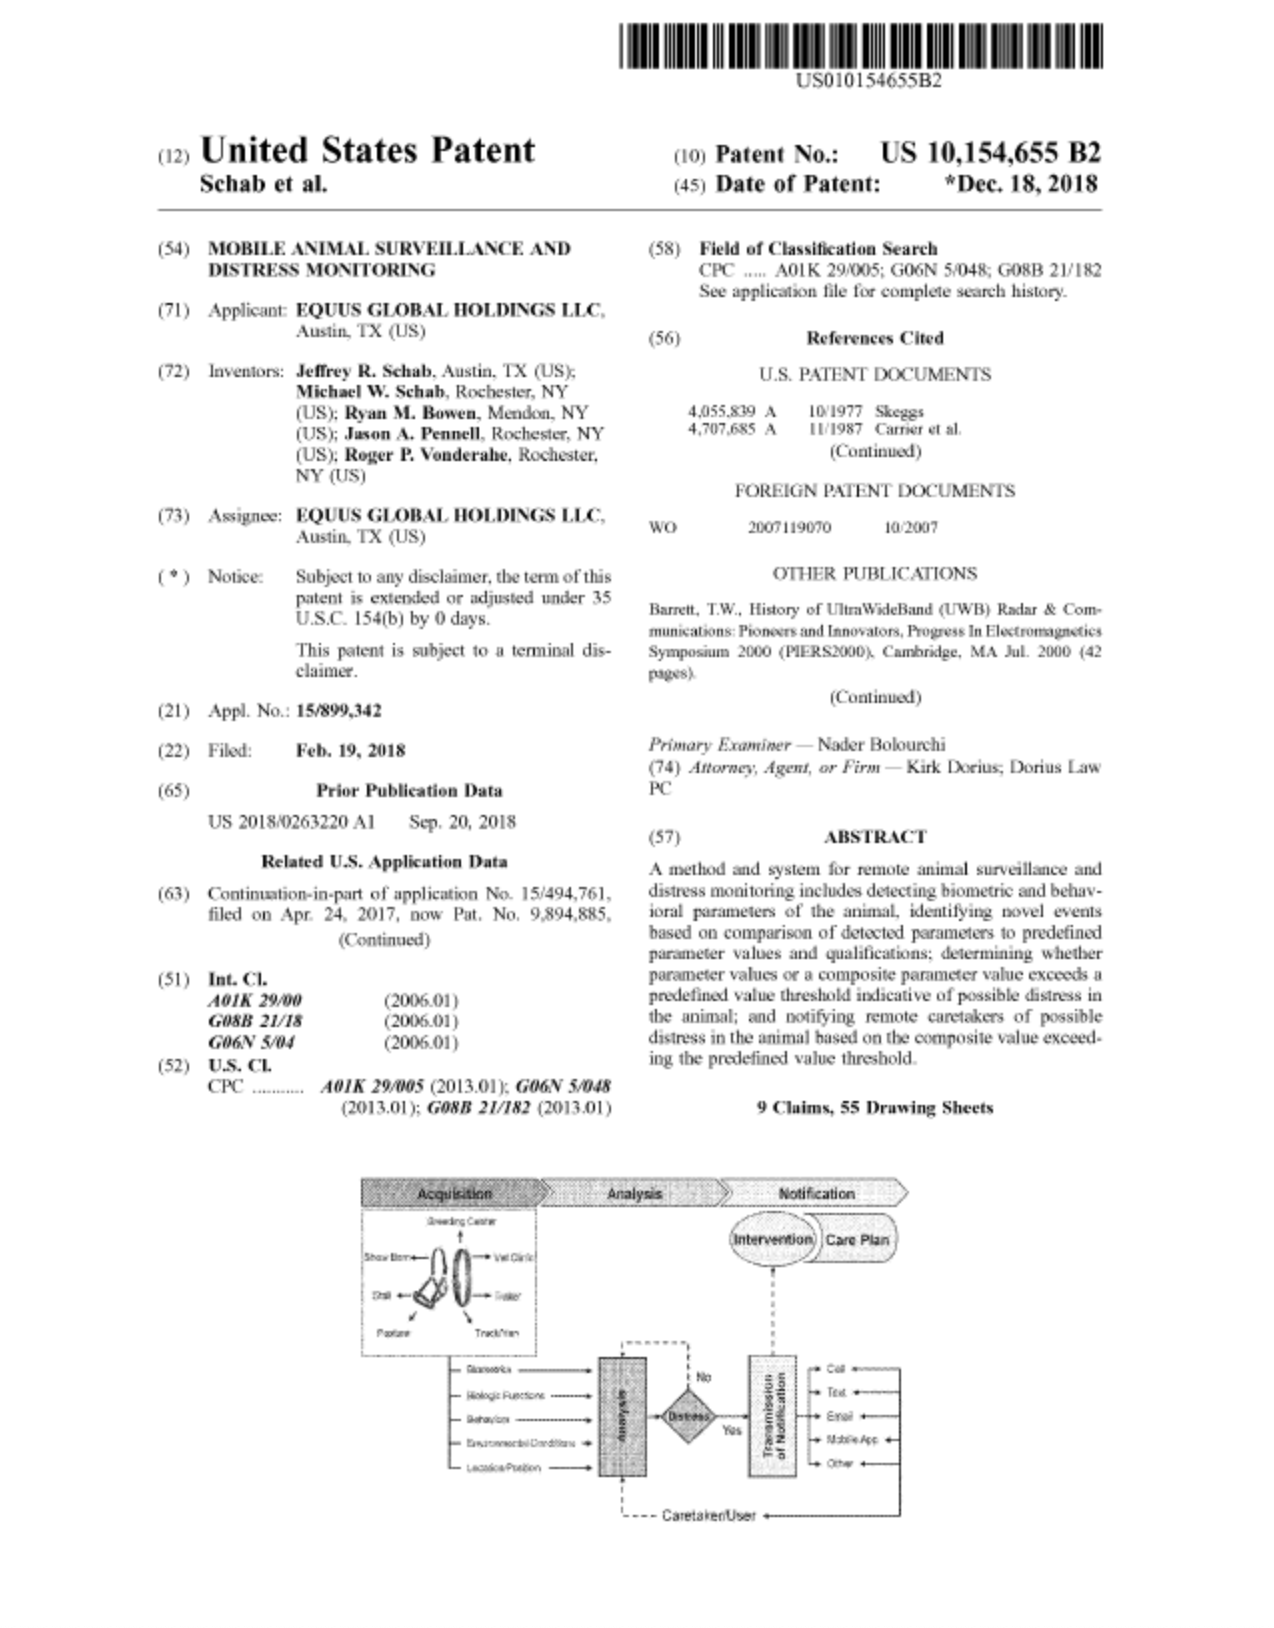 US patent no. 10,154,655